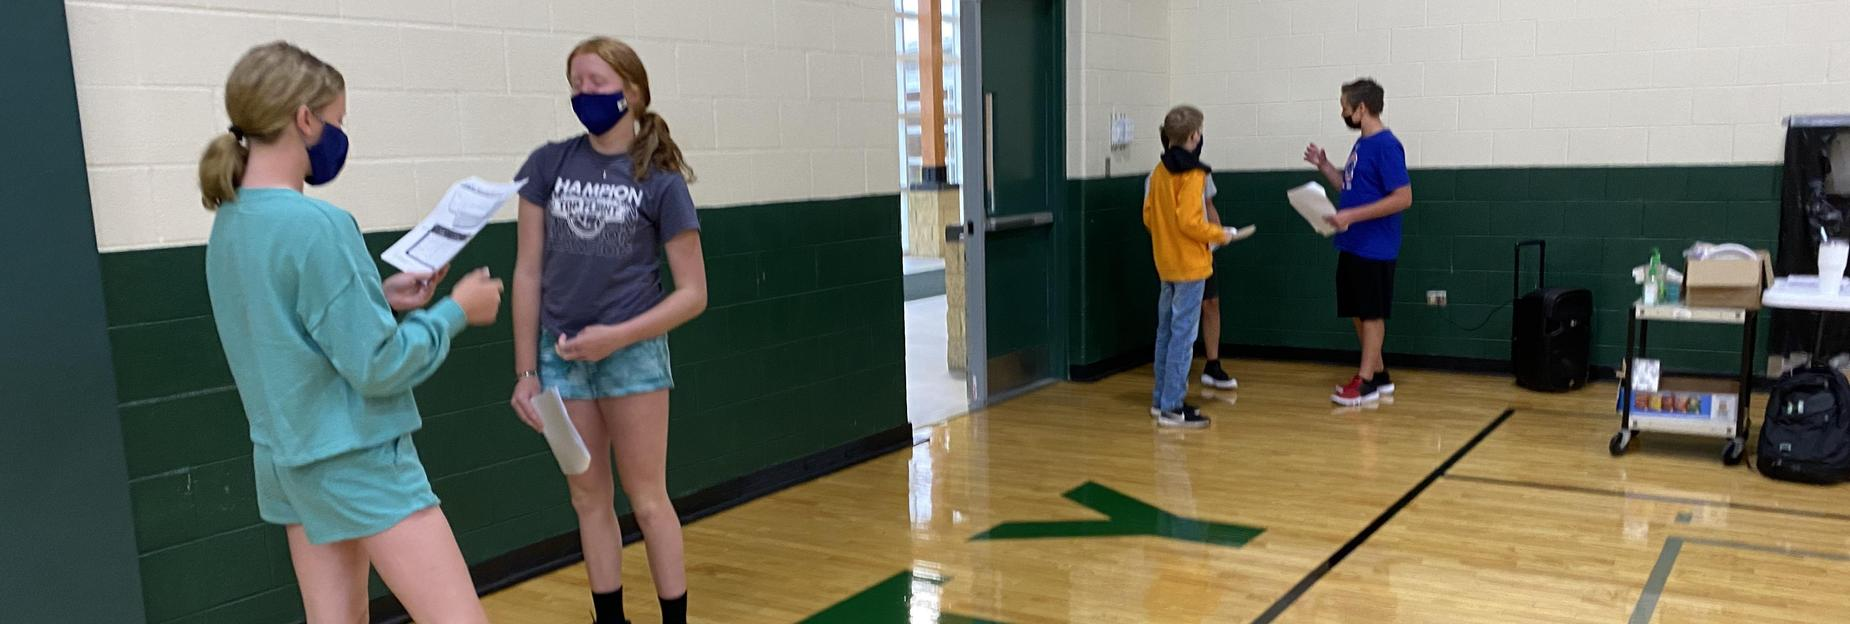 CCMS 6th grade activities